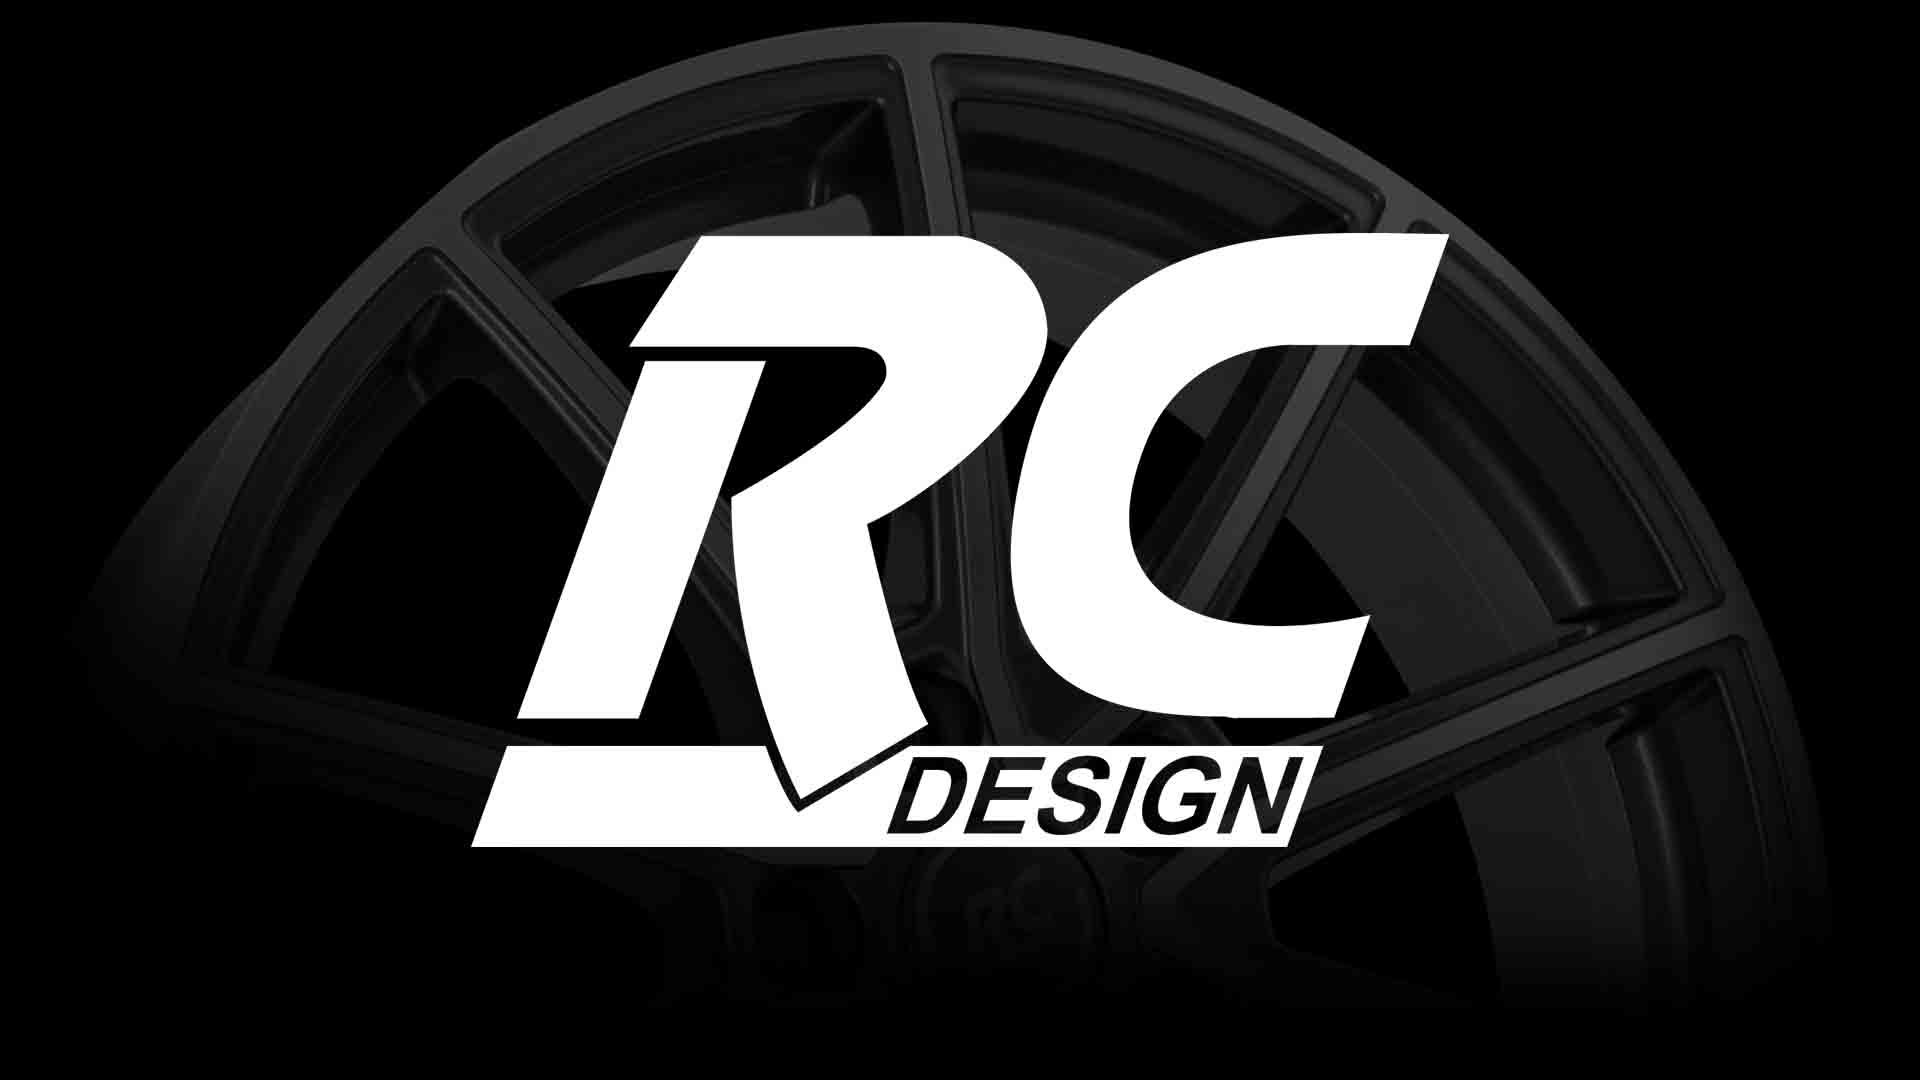 RC-Design Felgen Programm